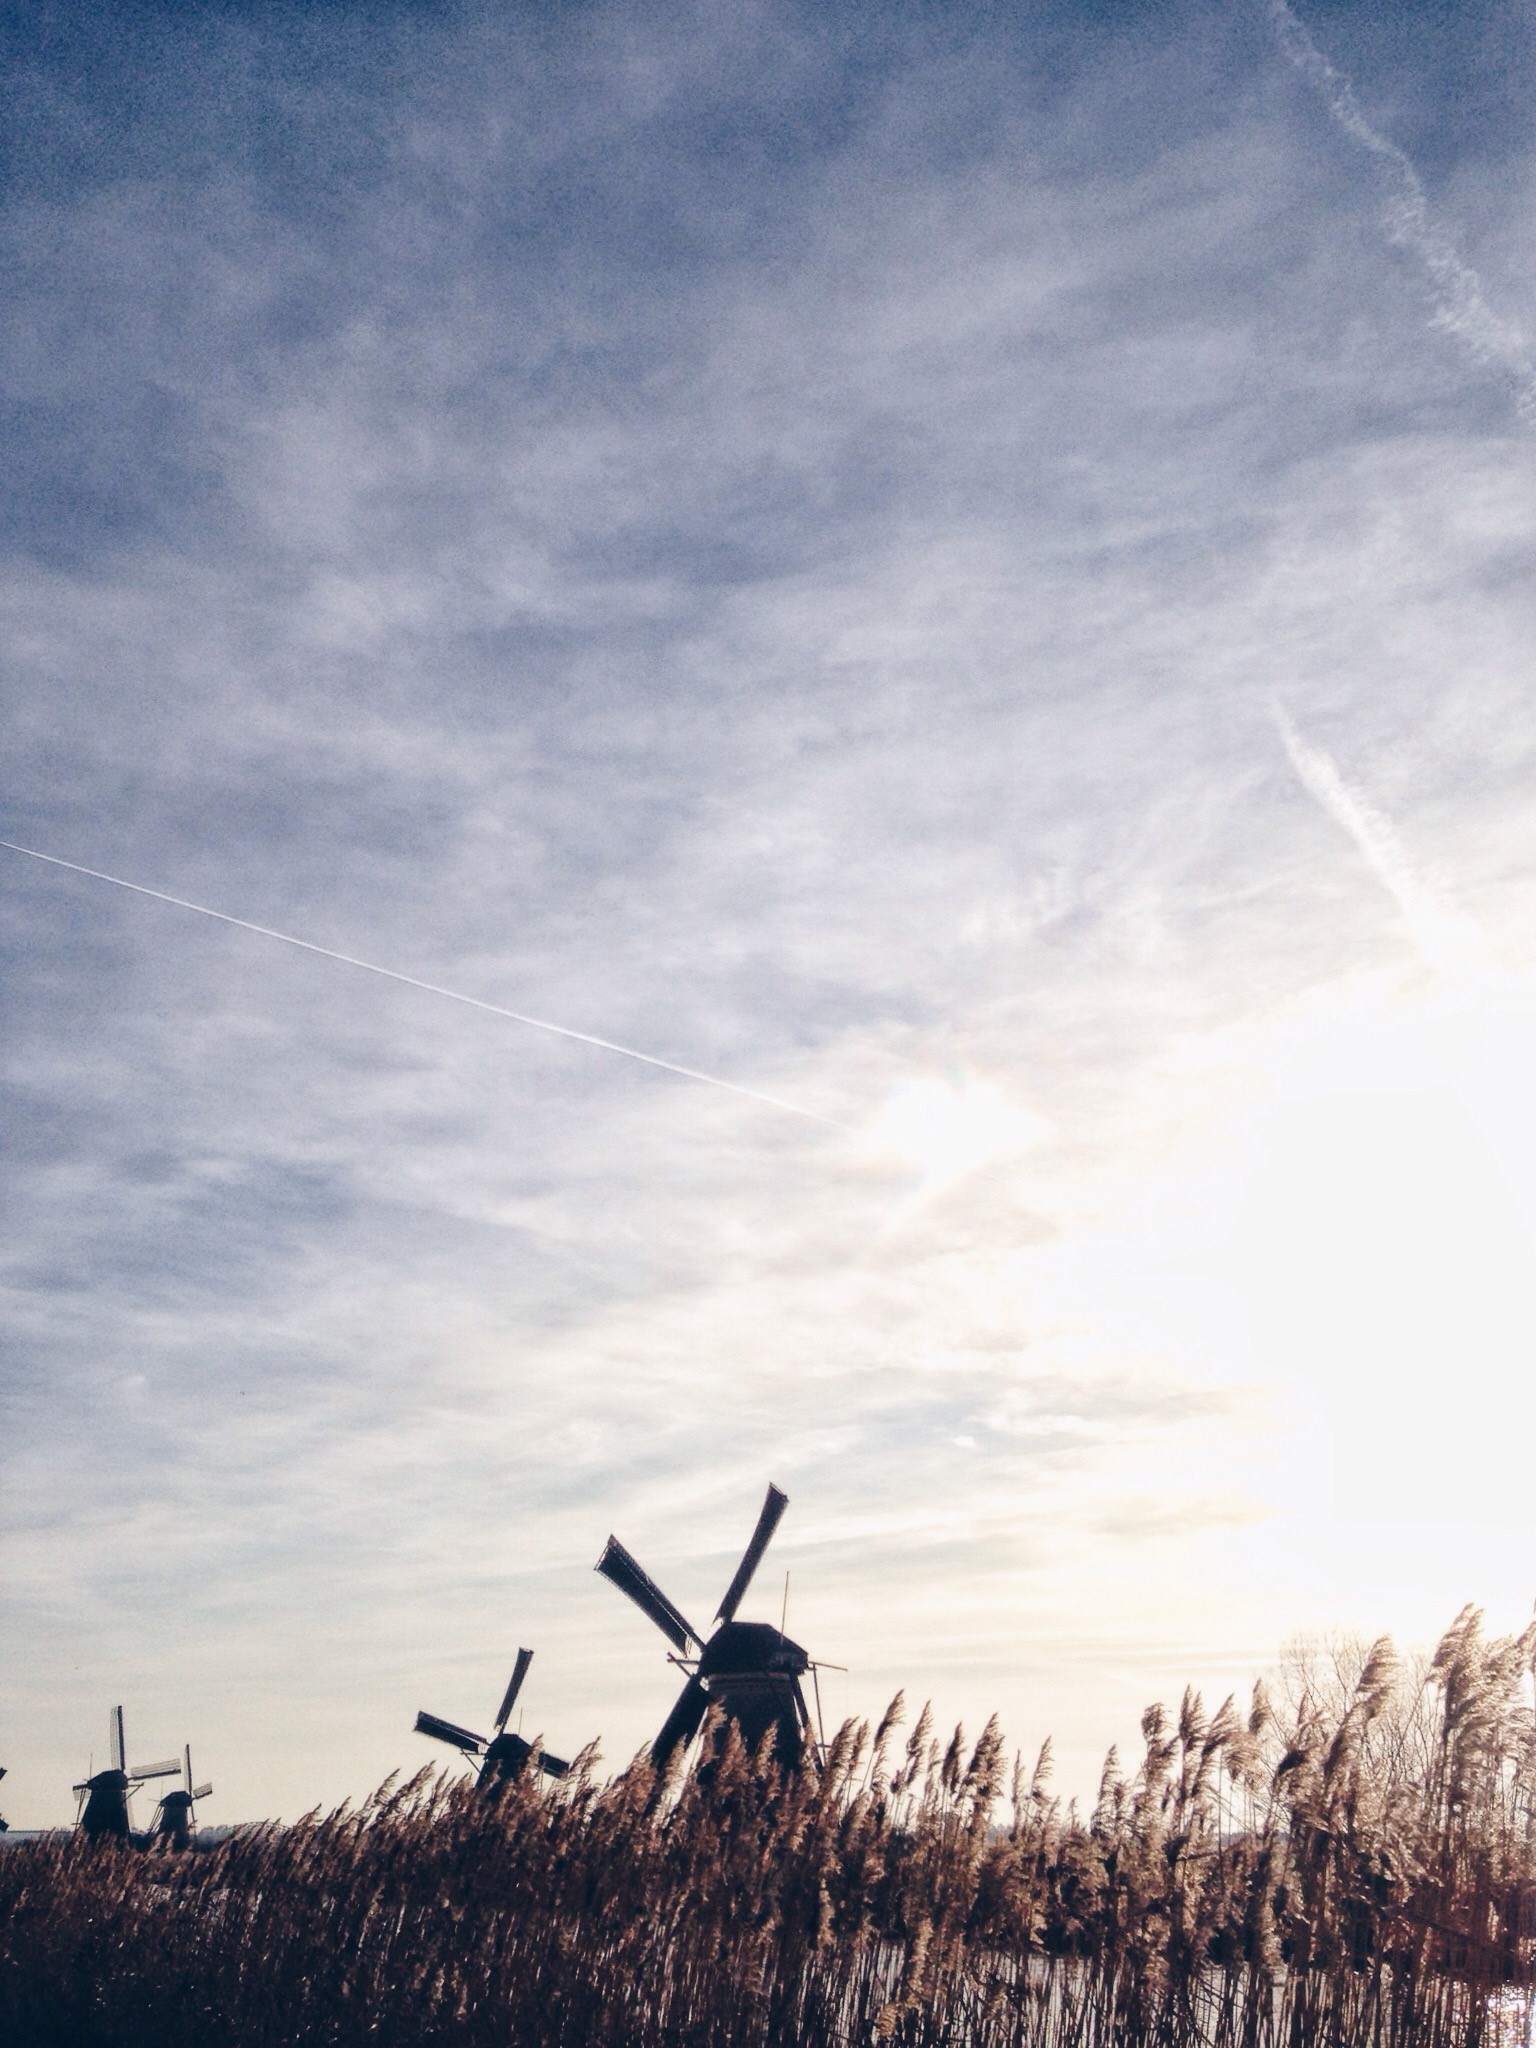 Windmills in The Netherlands, Anna Egorova